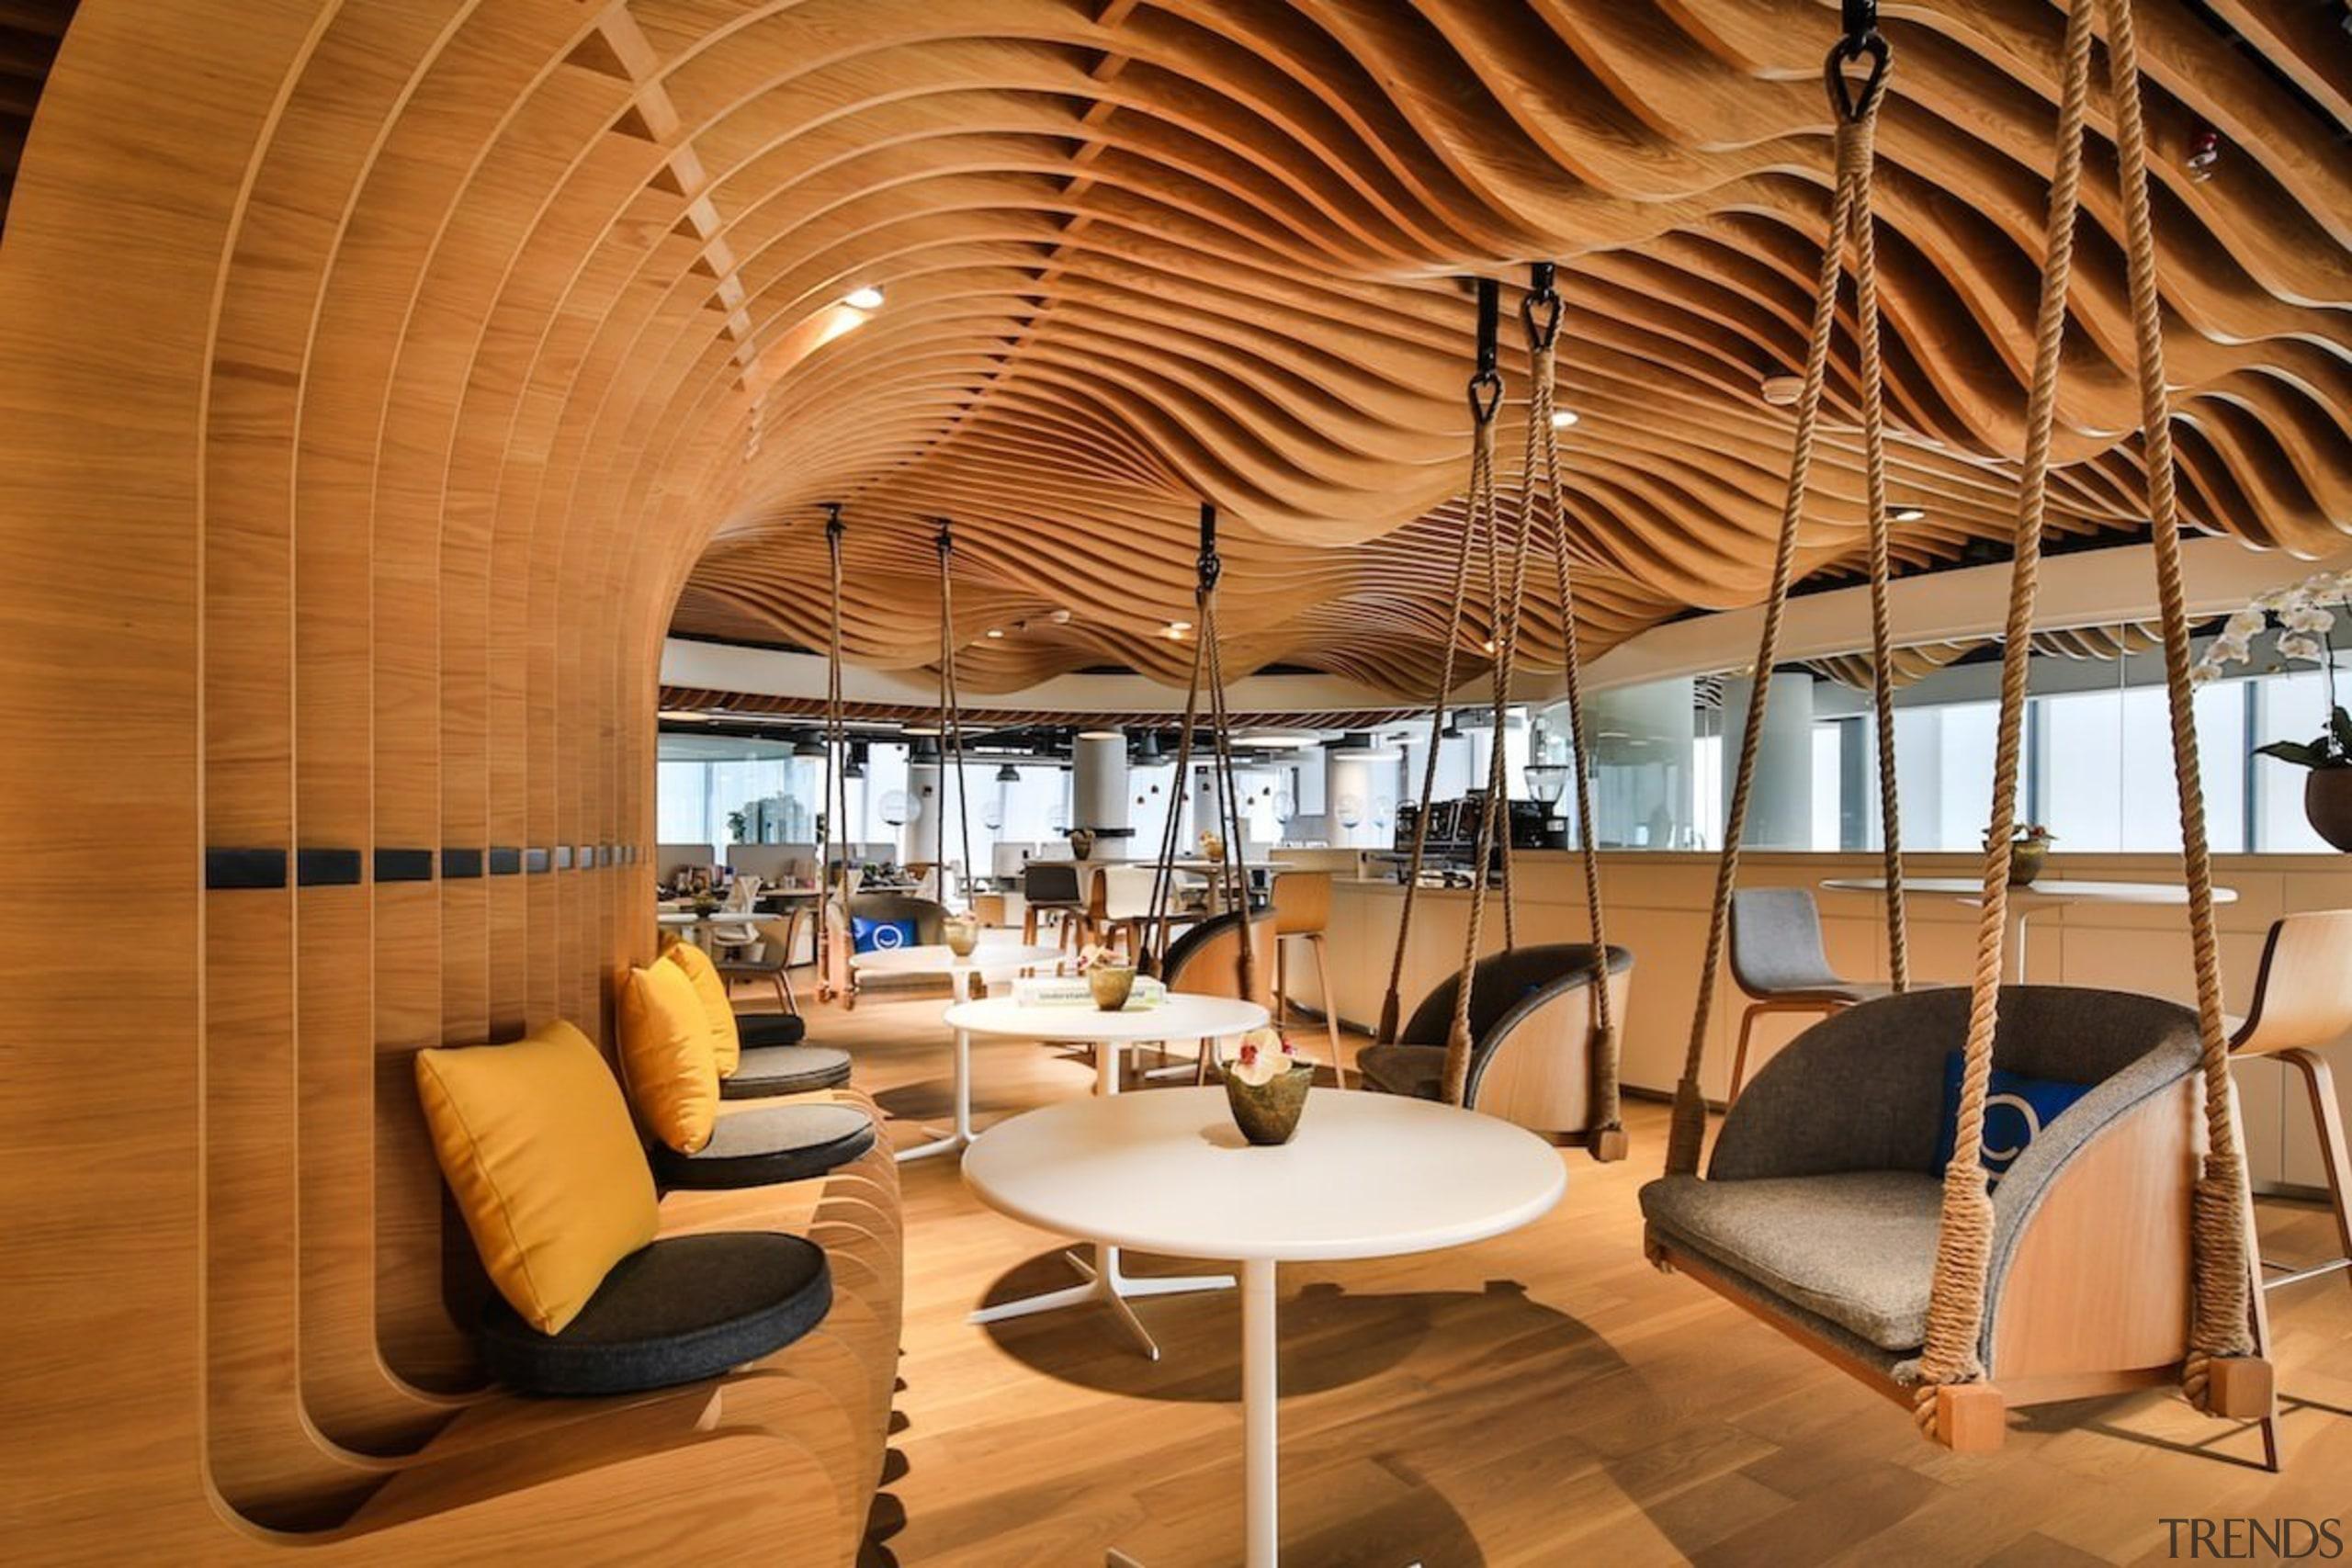 Smart Dubai - Smart Dubai - architecture | architecture, ceiling, interior design, lobby, brown, orange